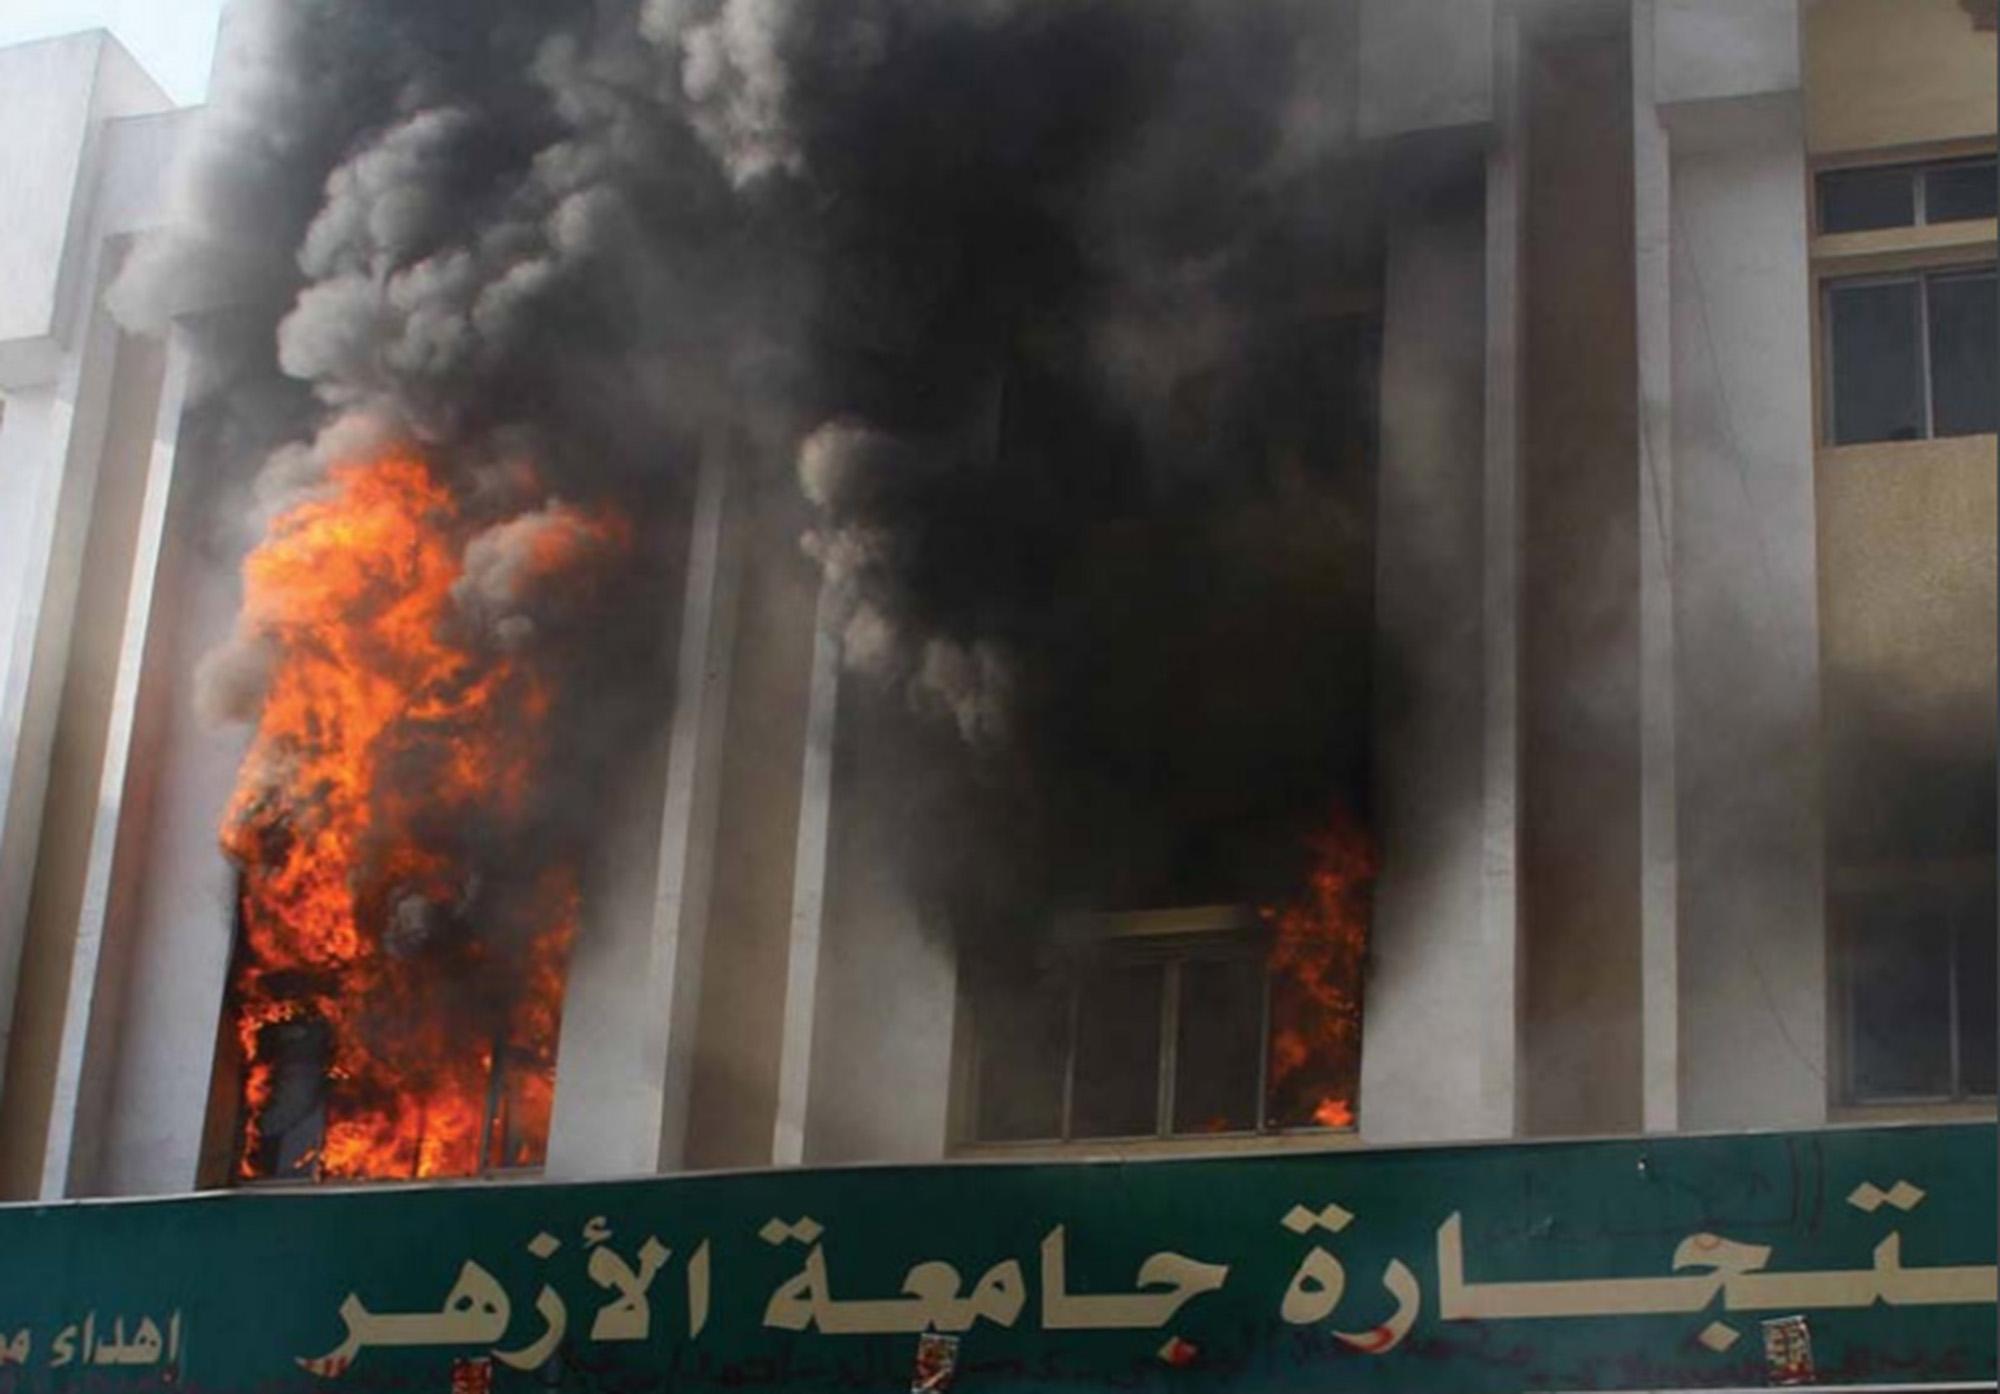 egypte-al-azhar-universiteit-brand-clash-politie-en-studenten